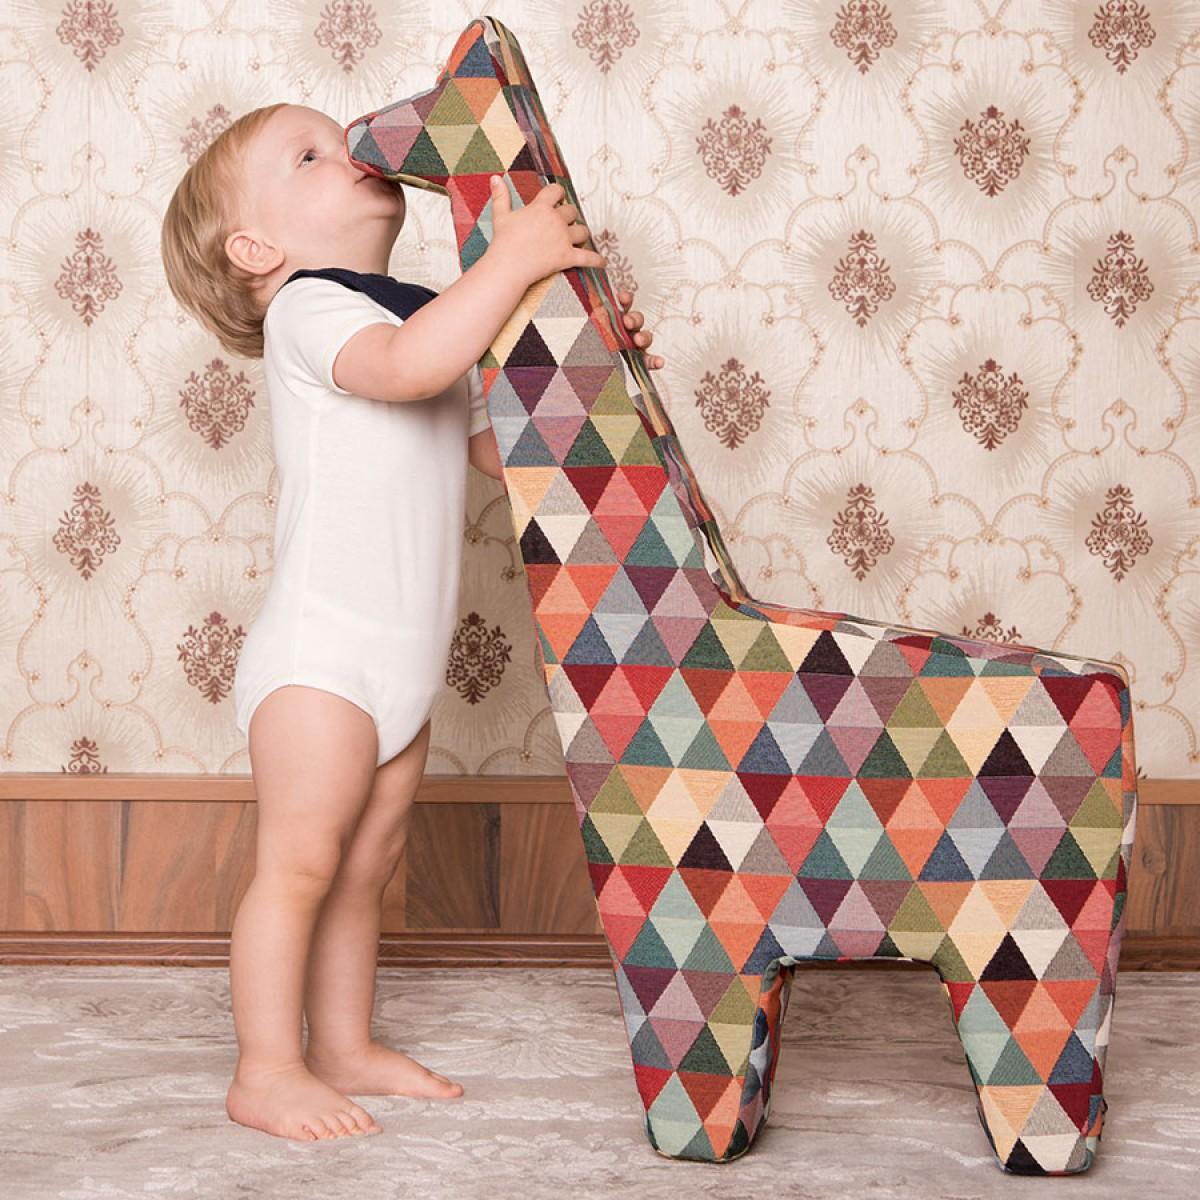 Woof - Spieltier zum Toben - Gerrit la Girafe